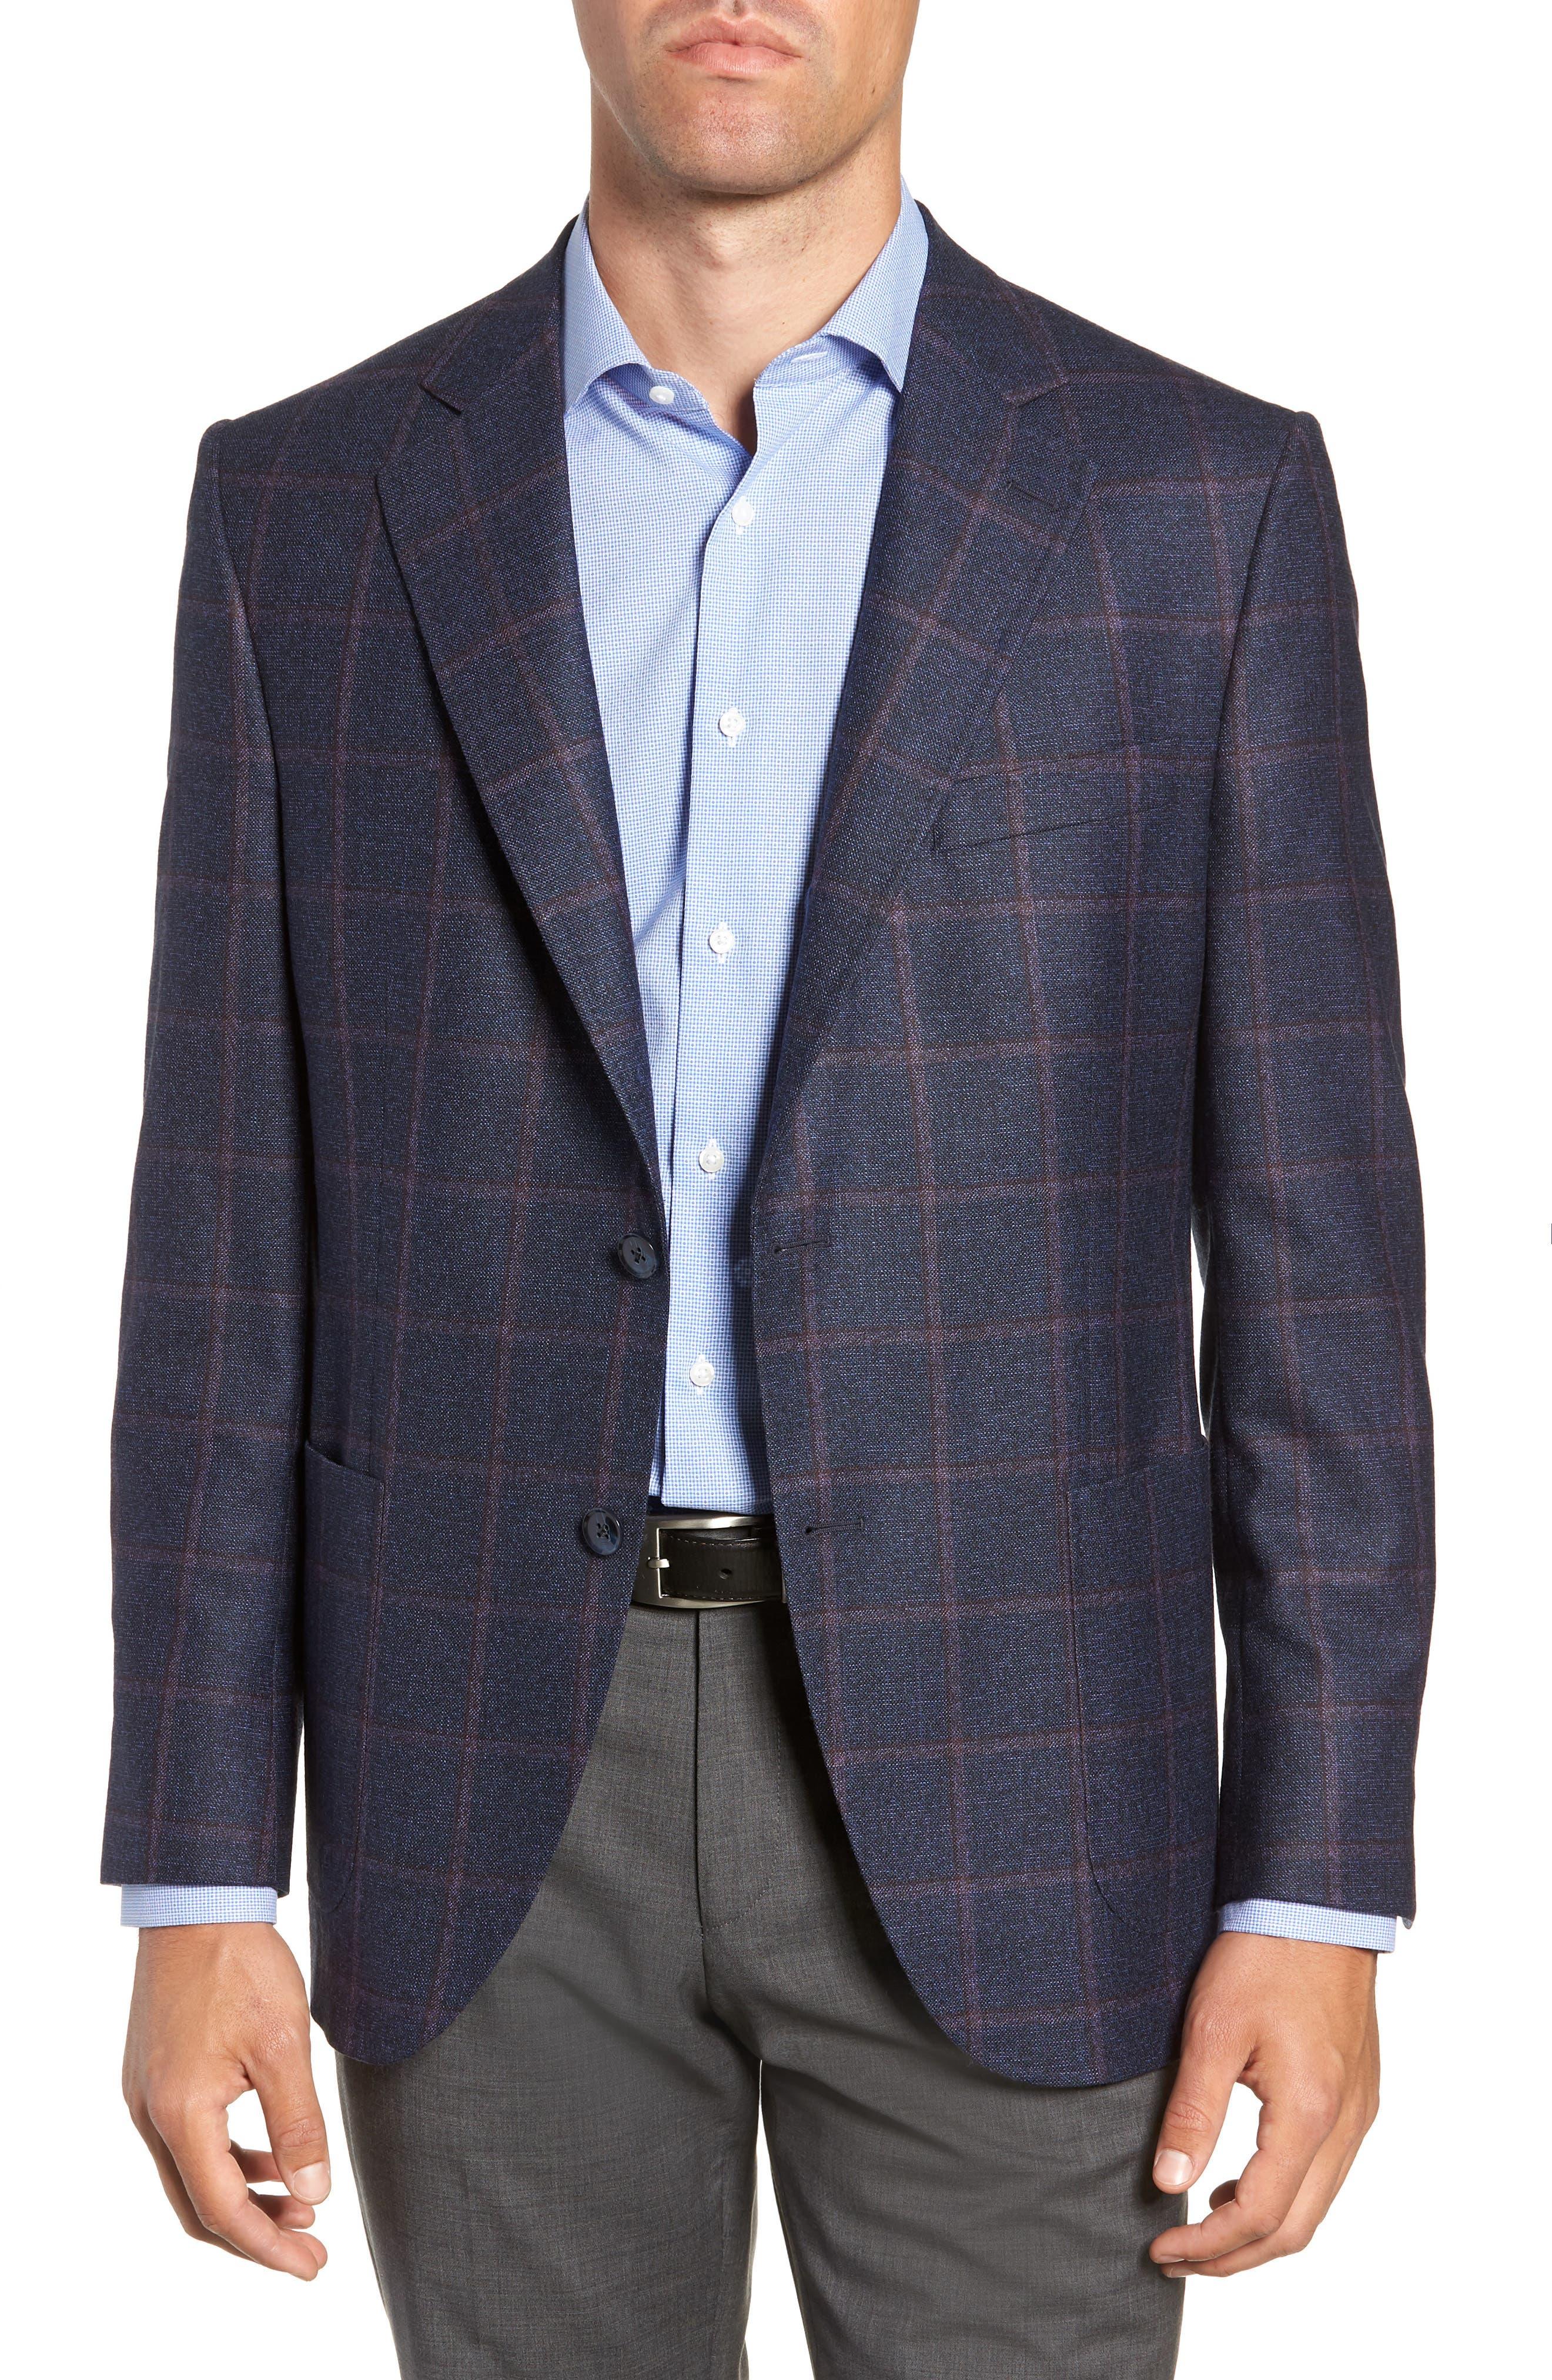 Hyperlight Classic Fit Wool Sport Coat,                             Main thumbnail 1, color,                             NAVY